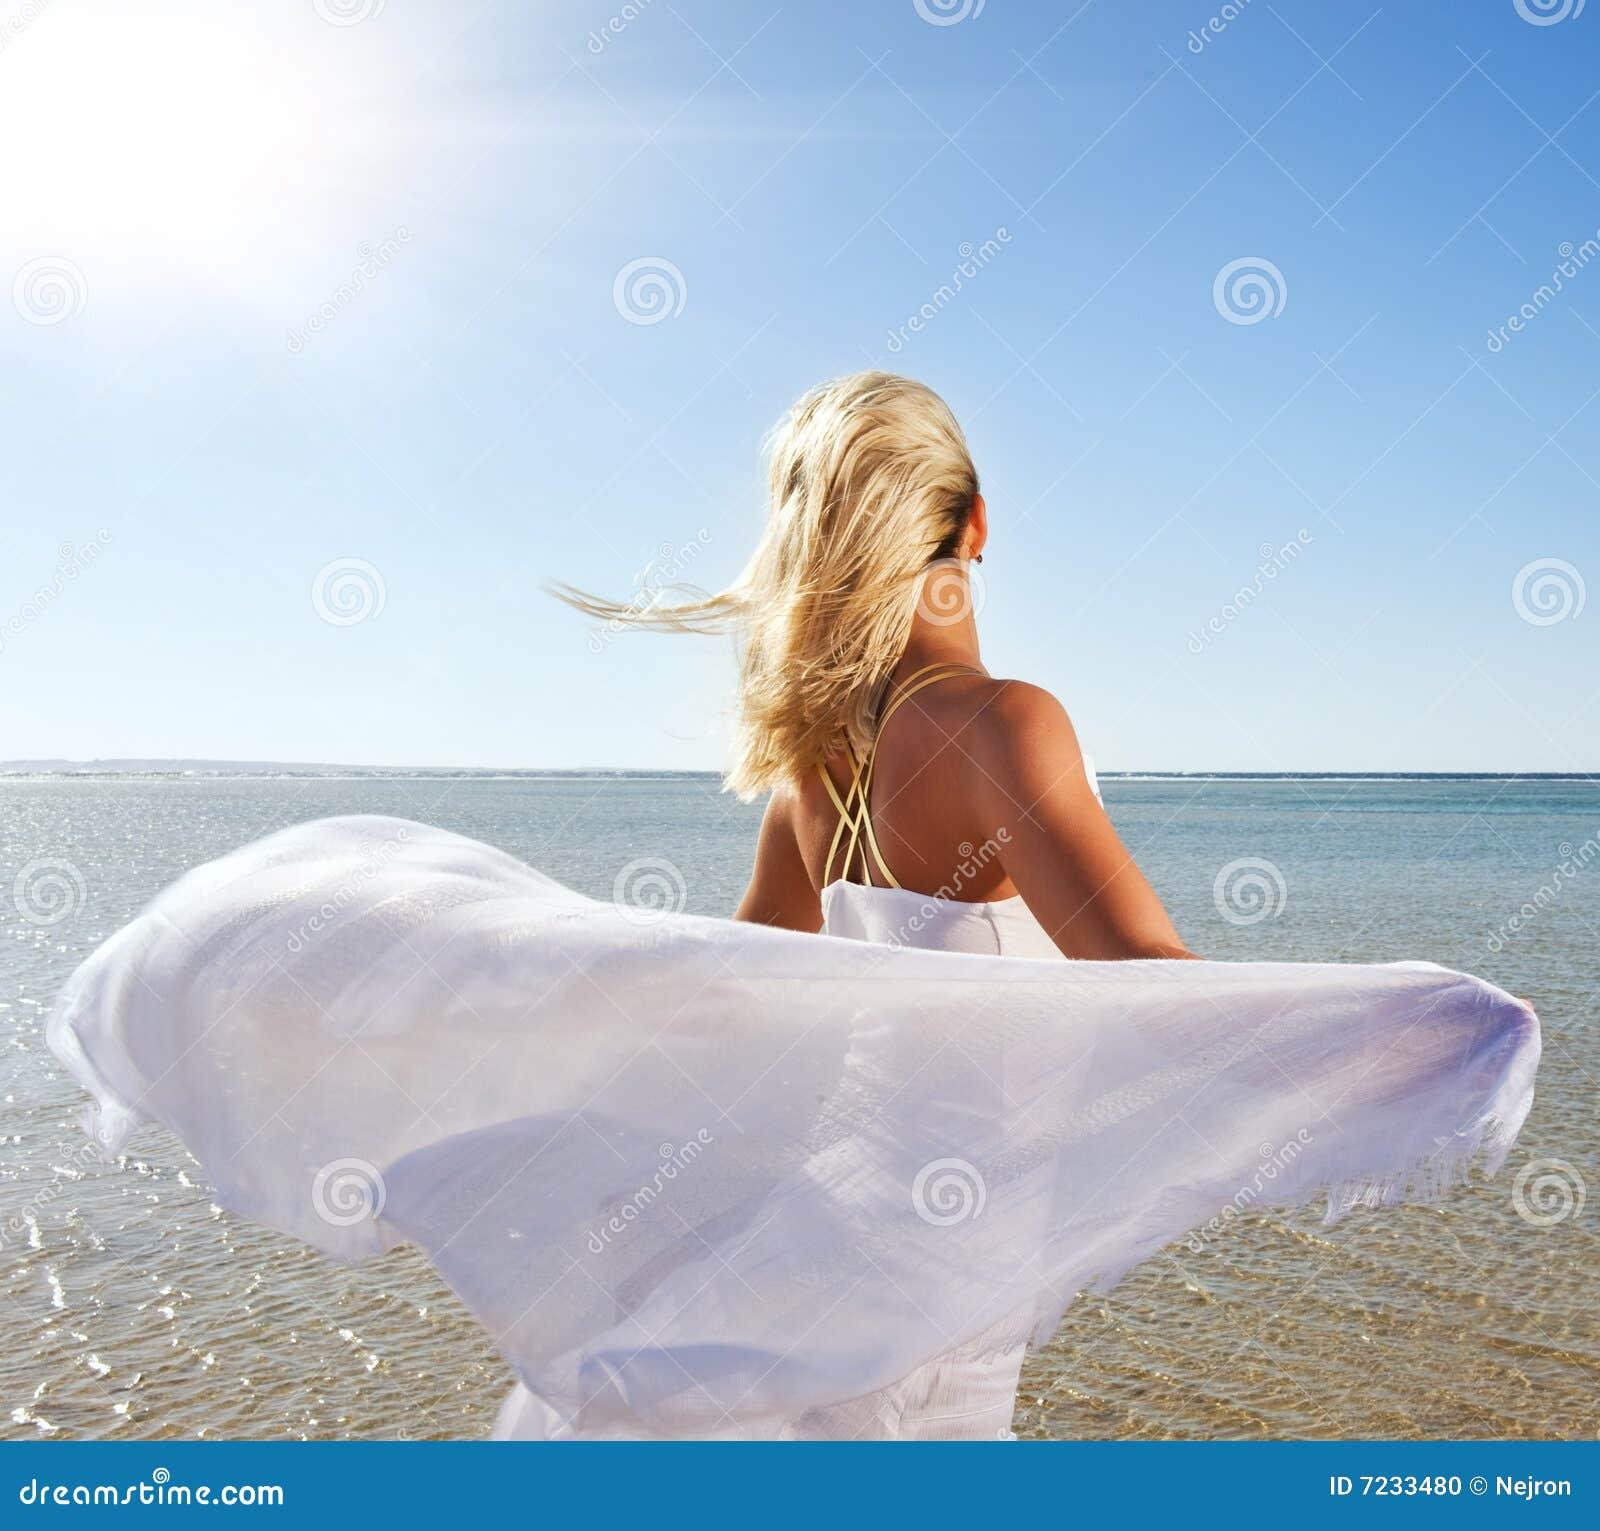 черно белые фото блондинок на море